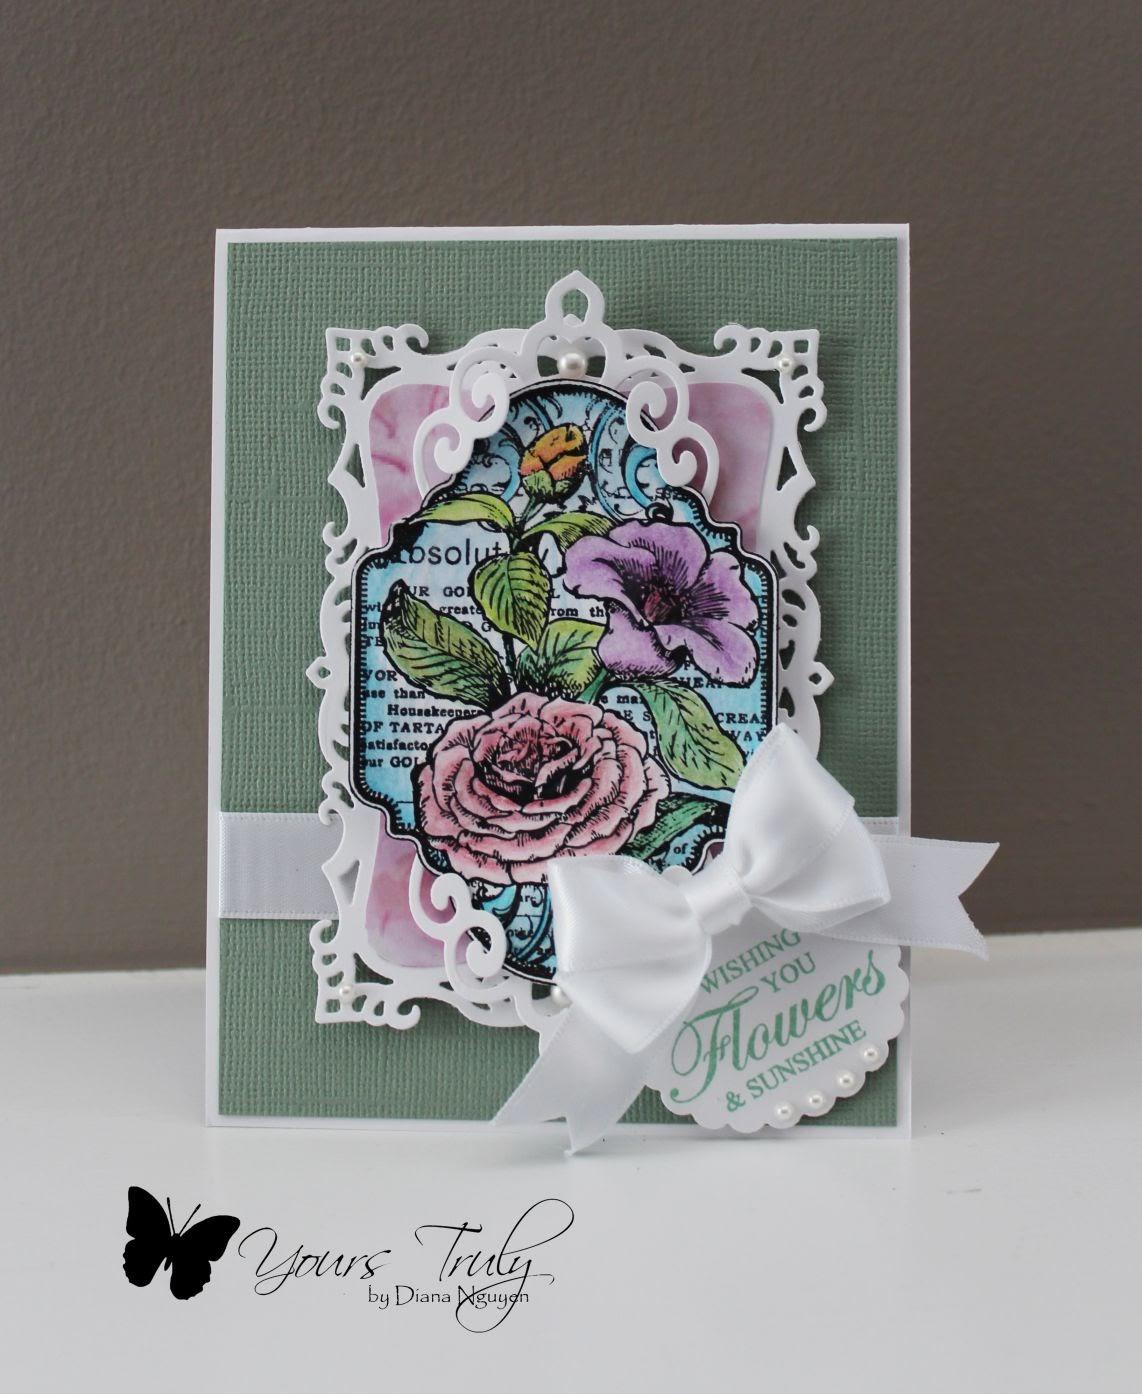 Diana Nguyen, JustRite, handmade card